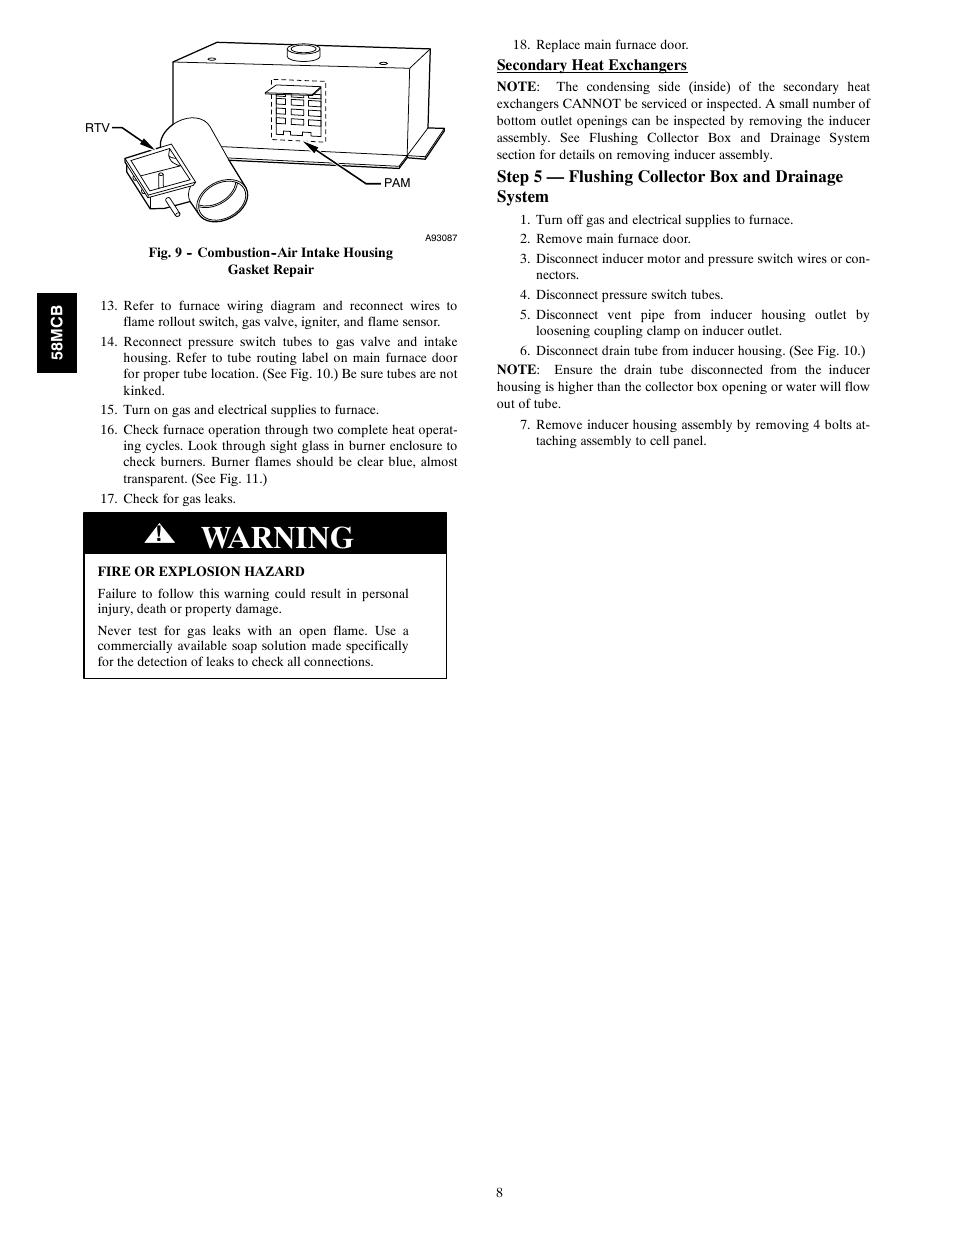 Carrier 58mcb manual